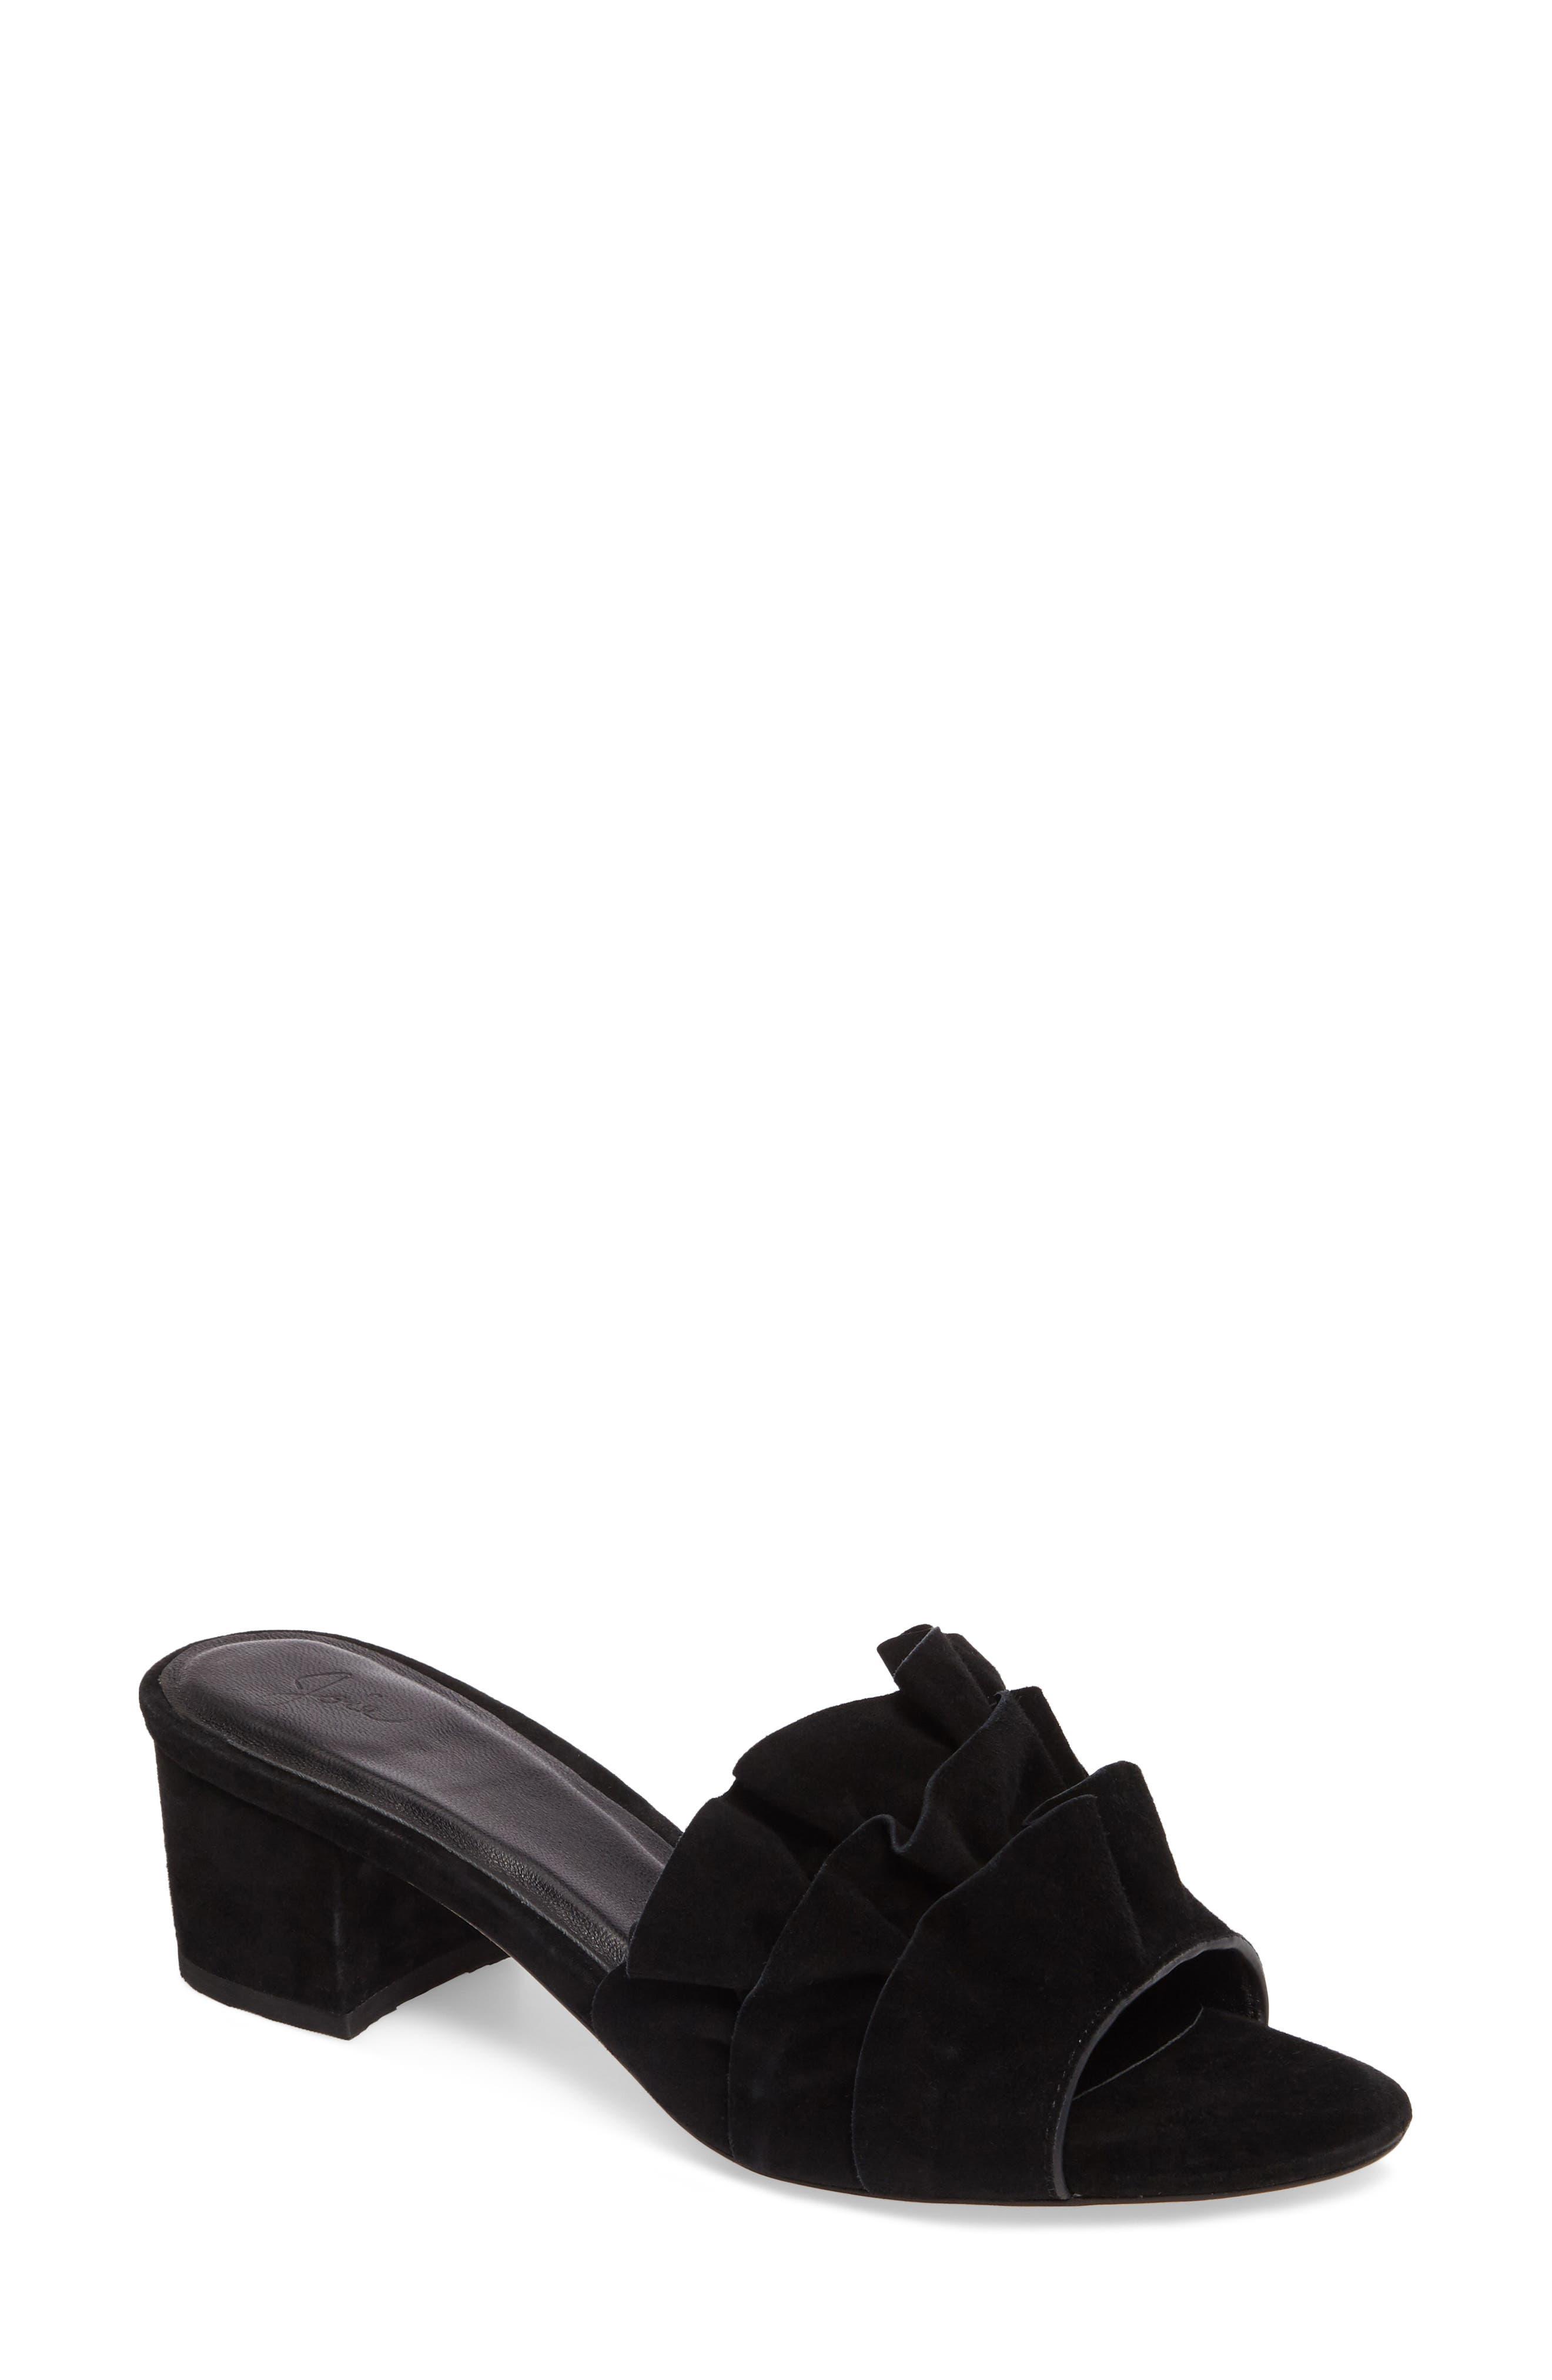 Mai Ruffle Slide Sandal,                             Main thumbnail 1, color,                             Black